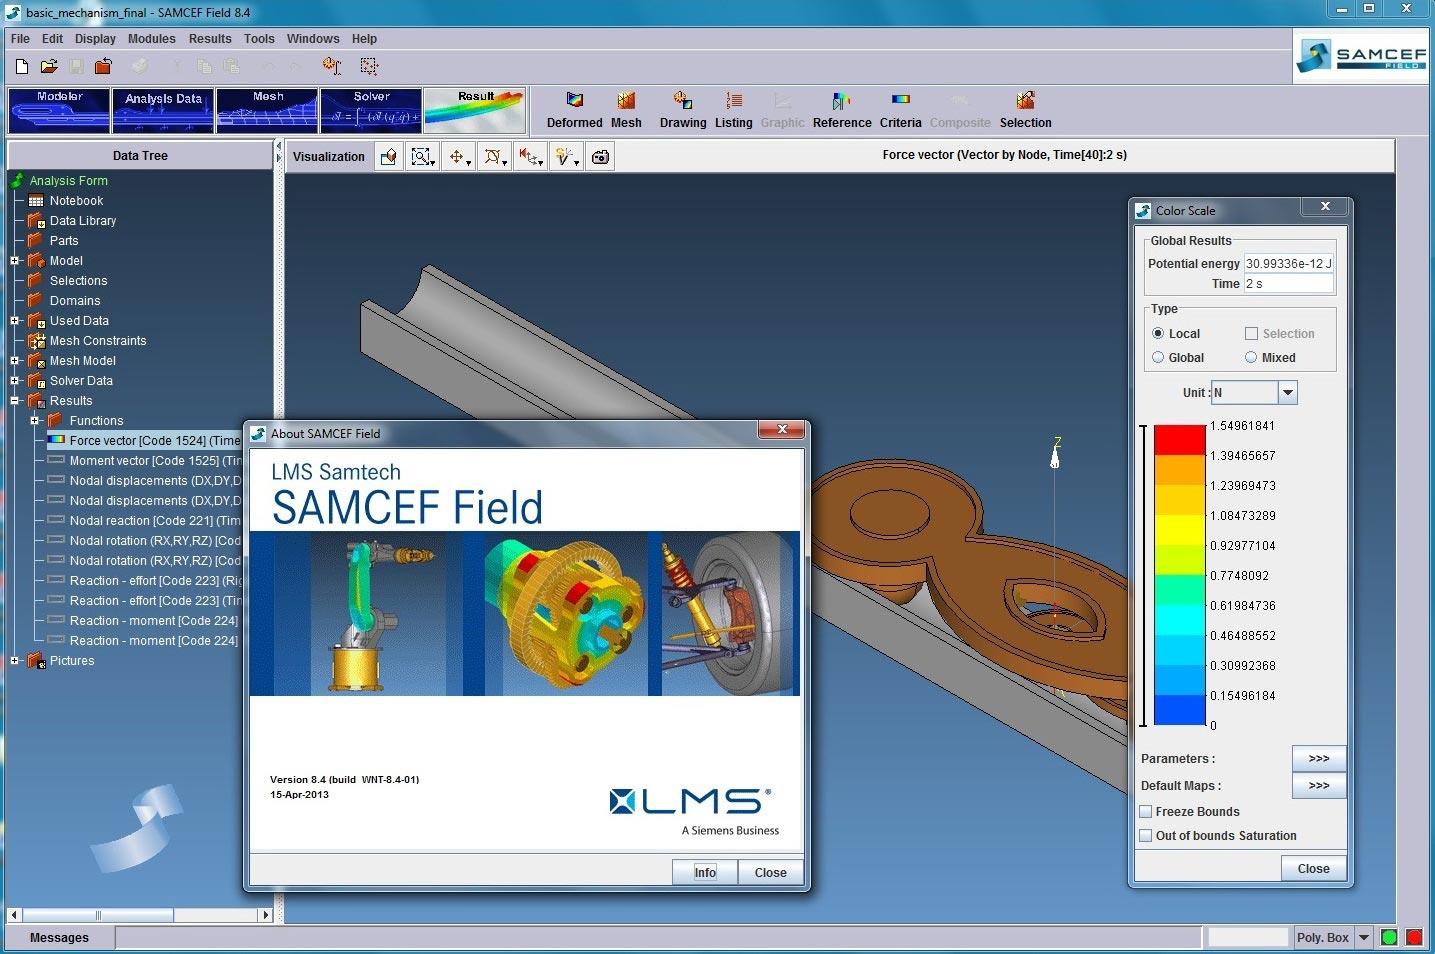 Siemens-LMS-Samcef-Field-Cover